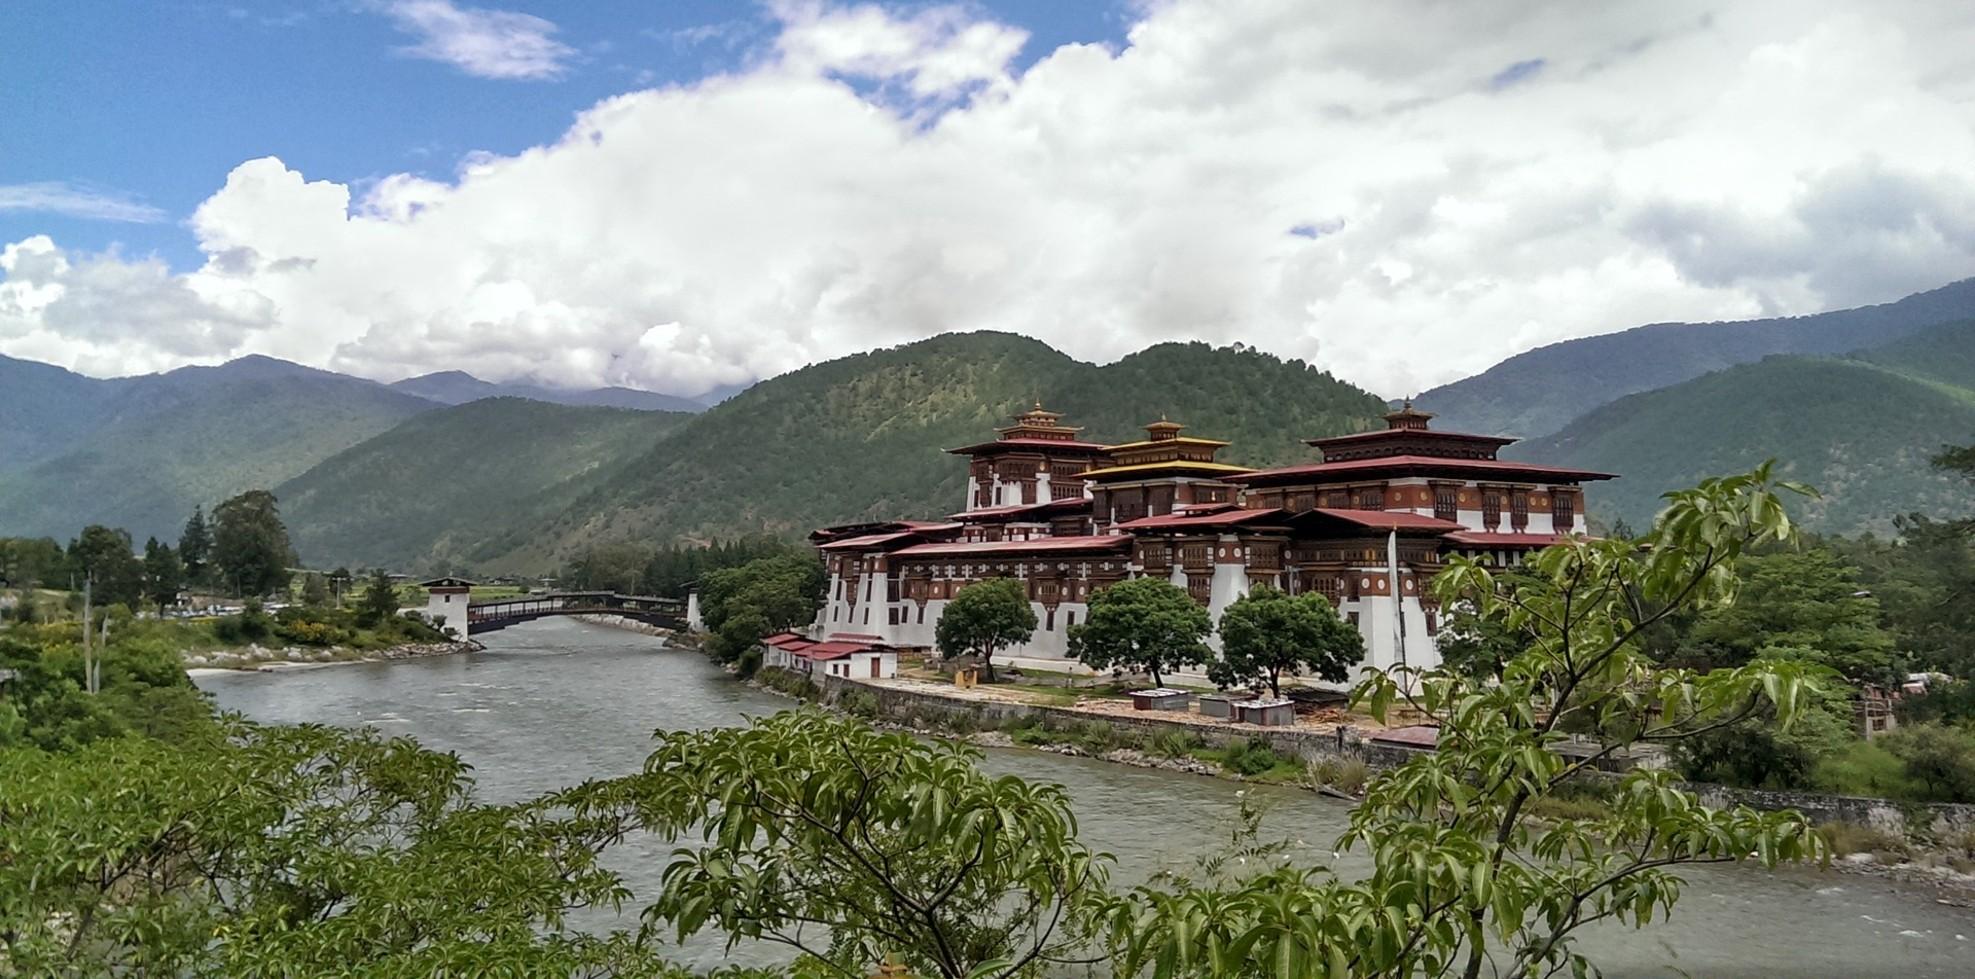 04 Nights 05 Days Bhutan Tour